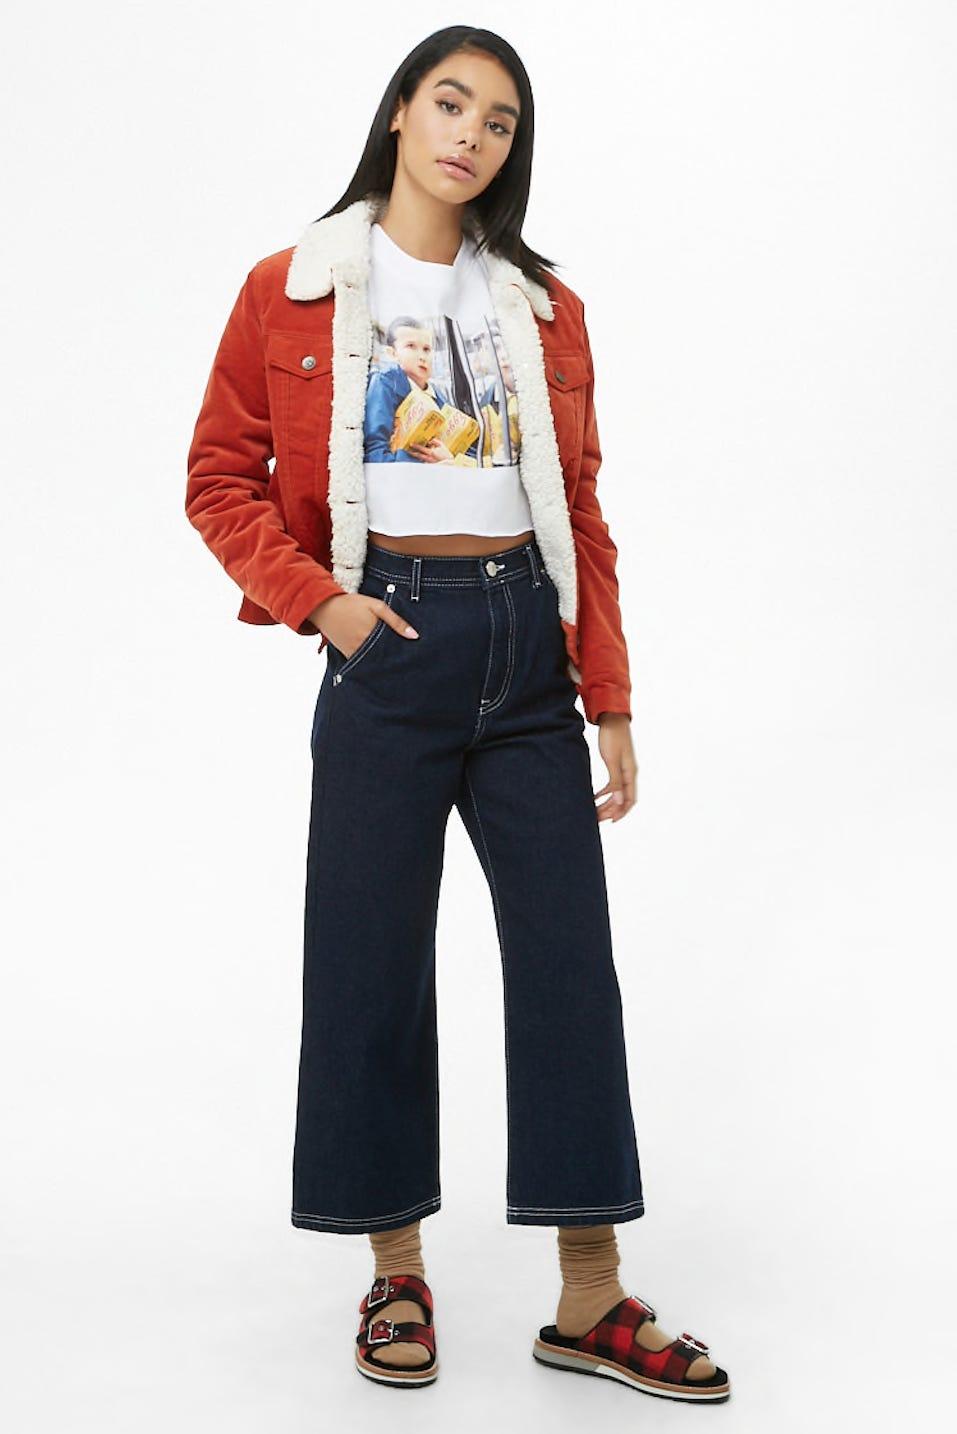 3b10faed Best Stranger Things Merchandise: Nike, H&M, & More